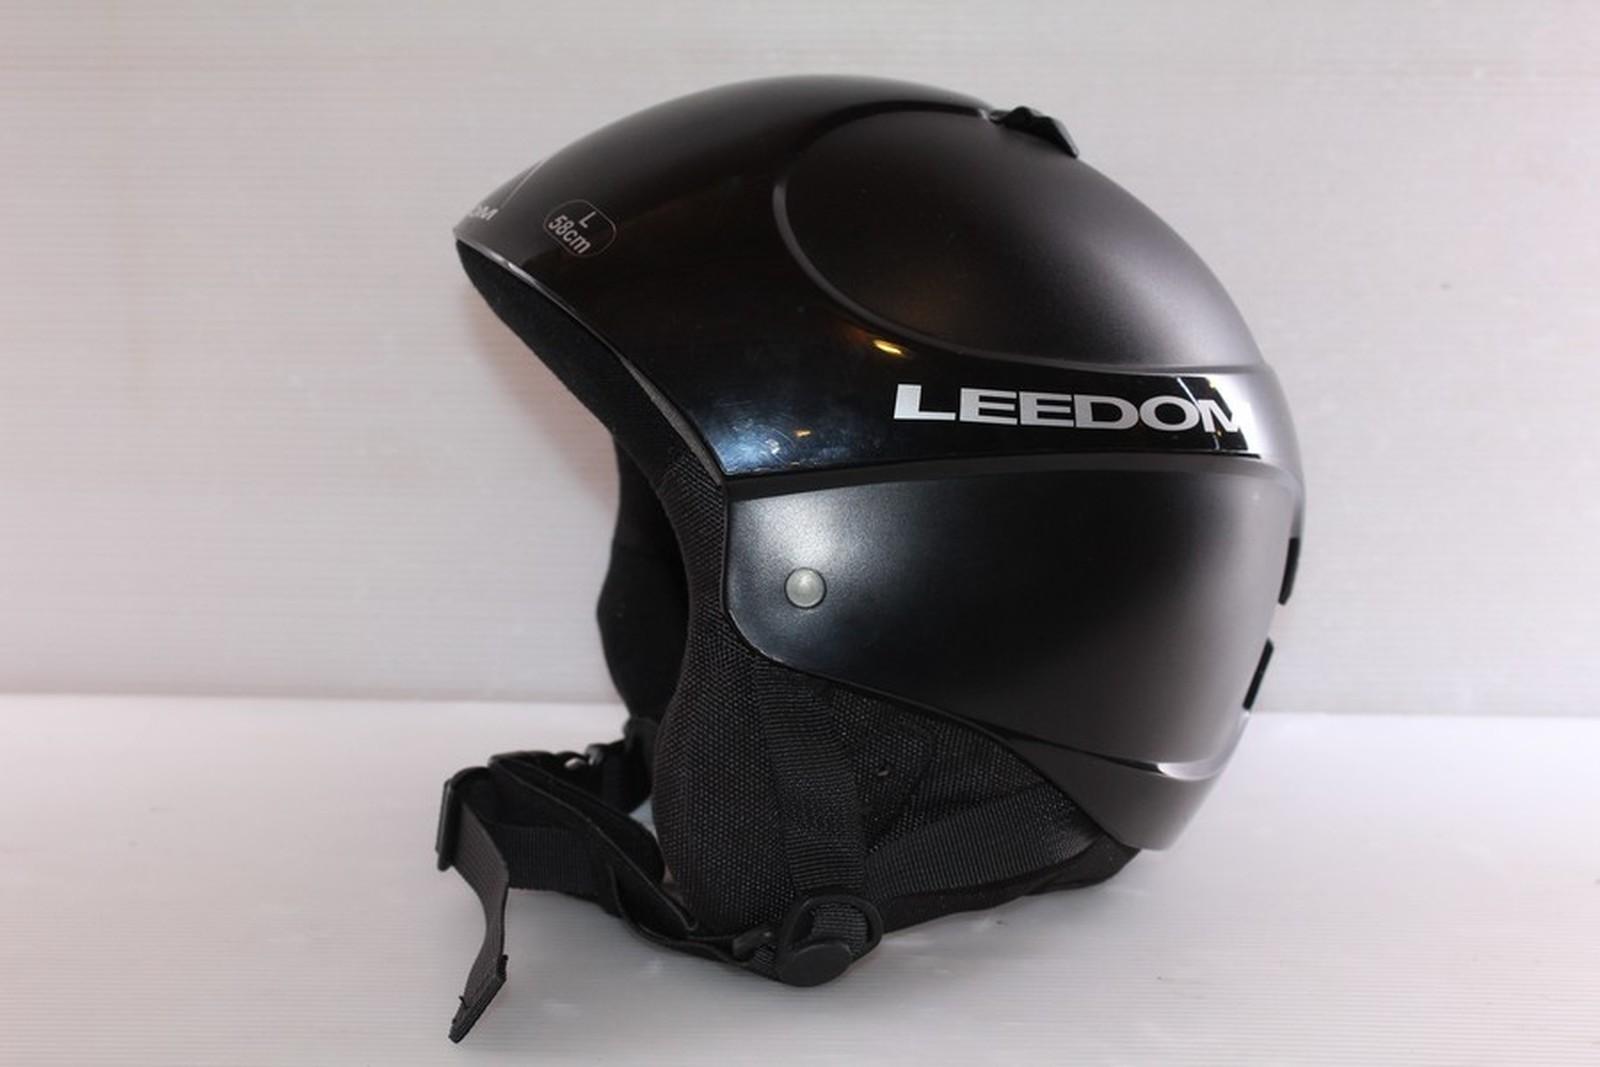 Dámská lyžařská helma Leedom Black vel. 58